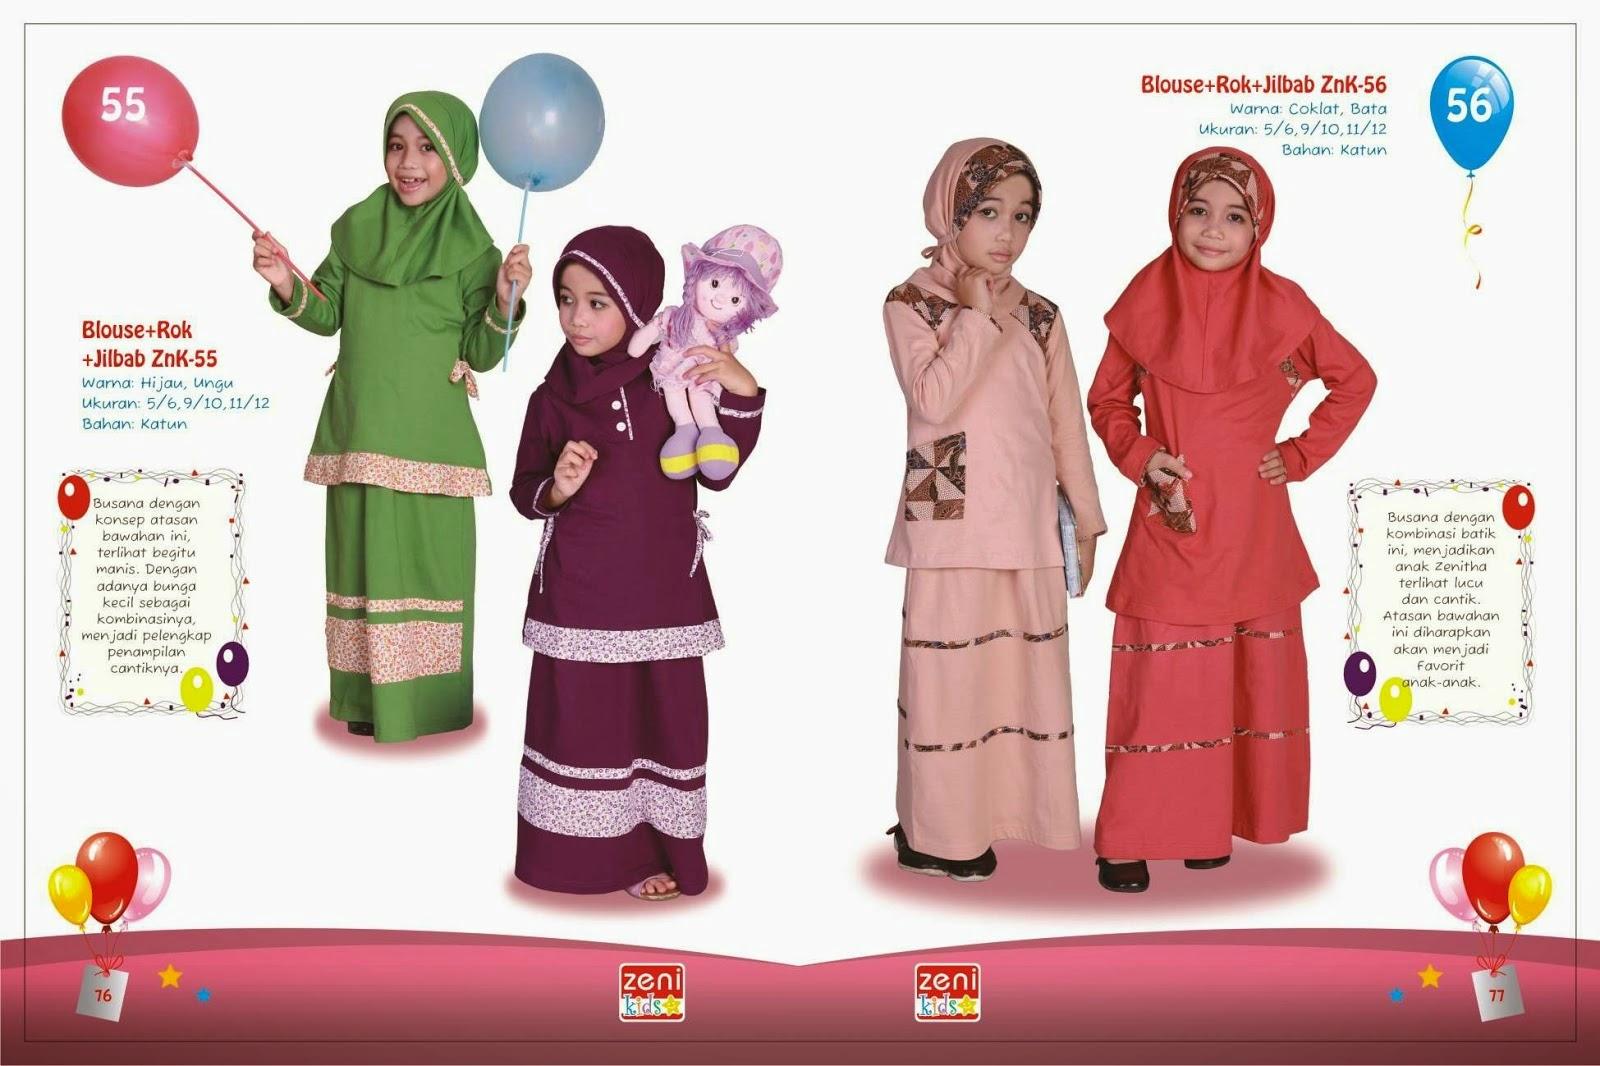 Foto Baju Gamis Anak Lucu Gamis Murni